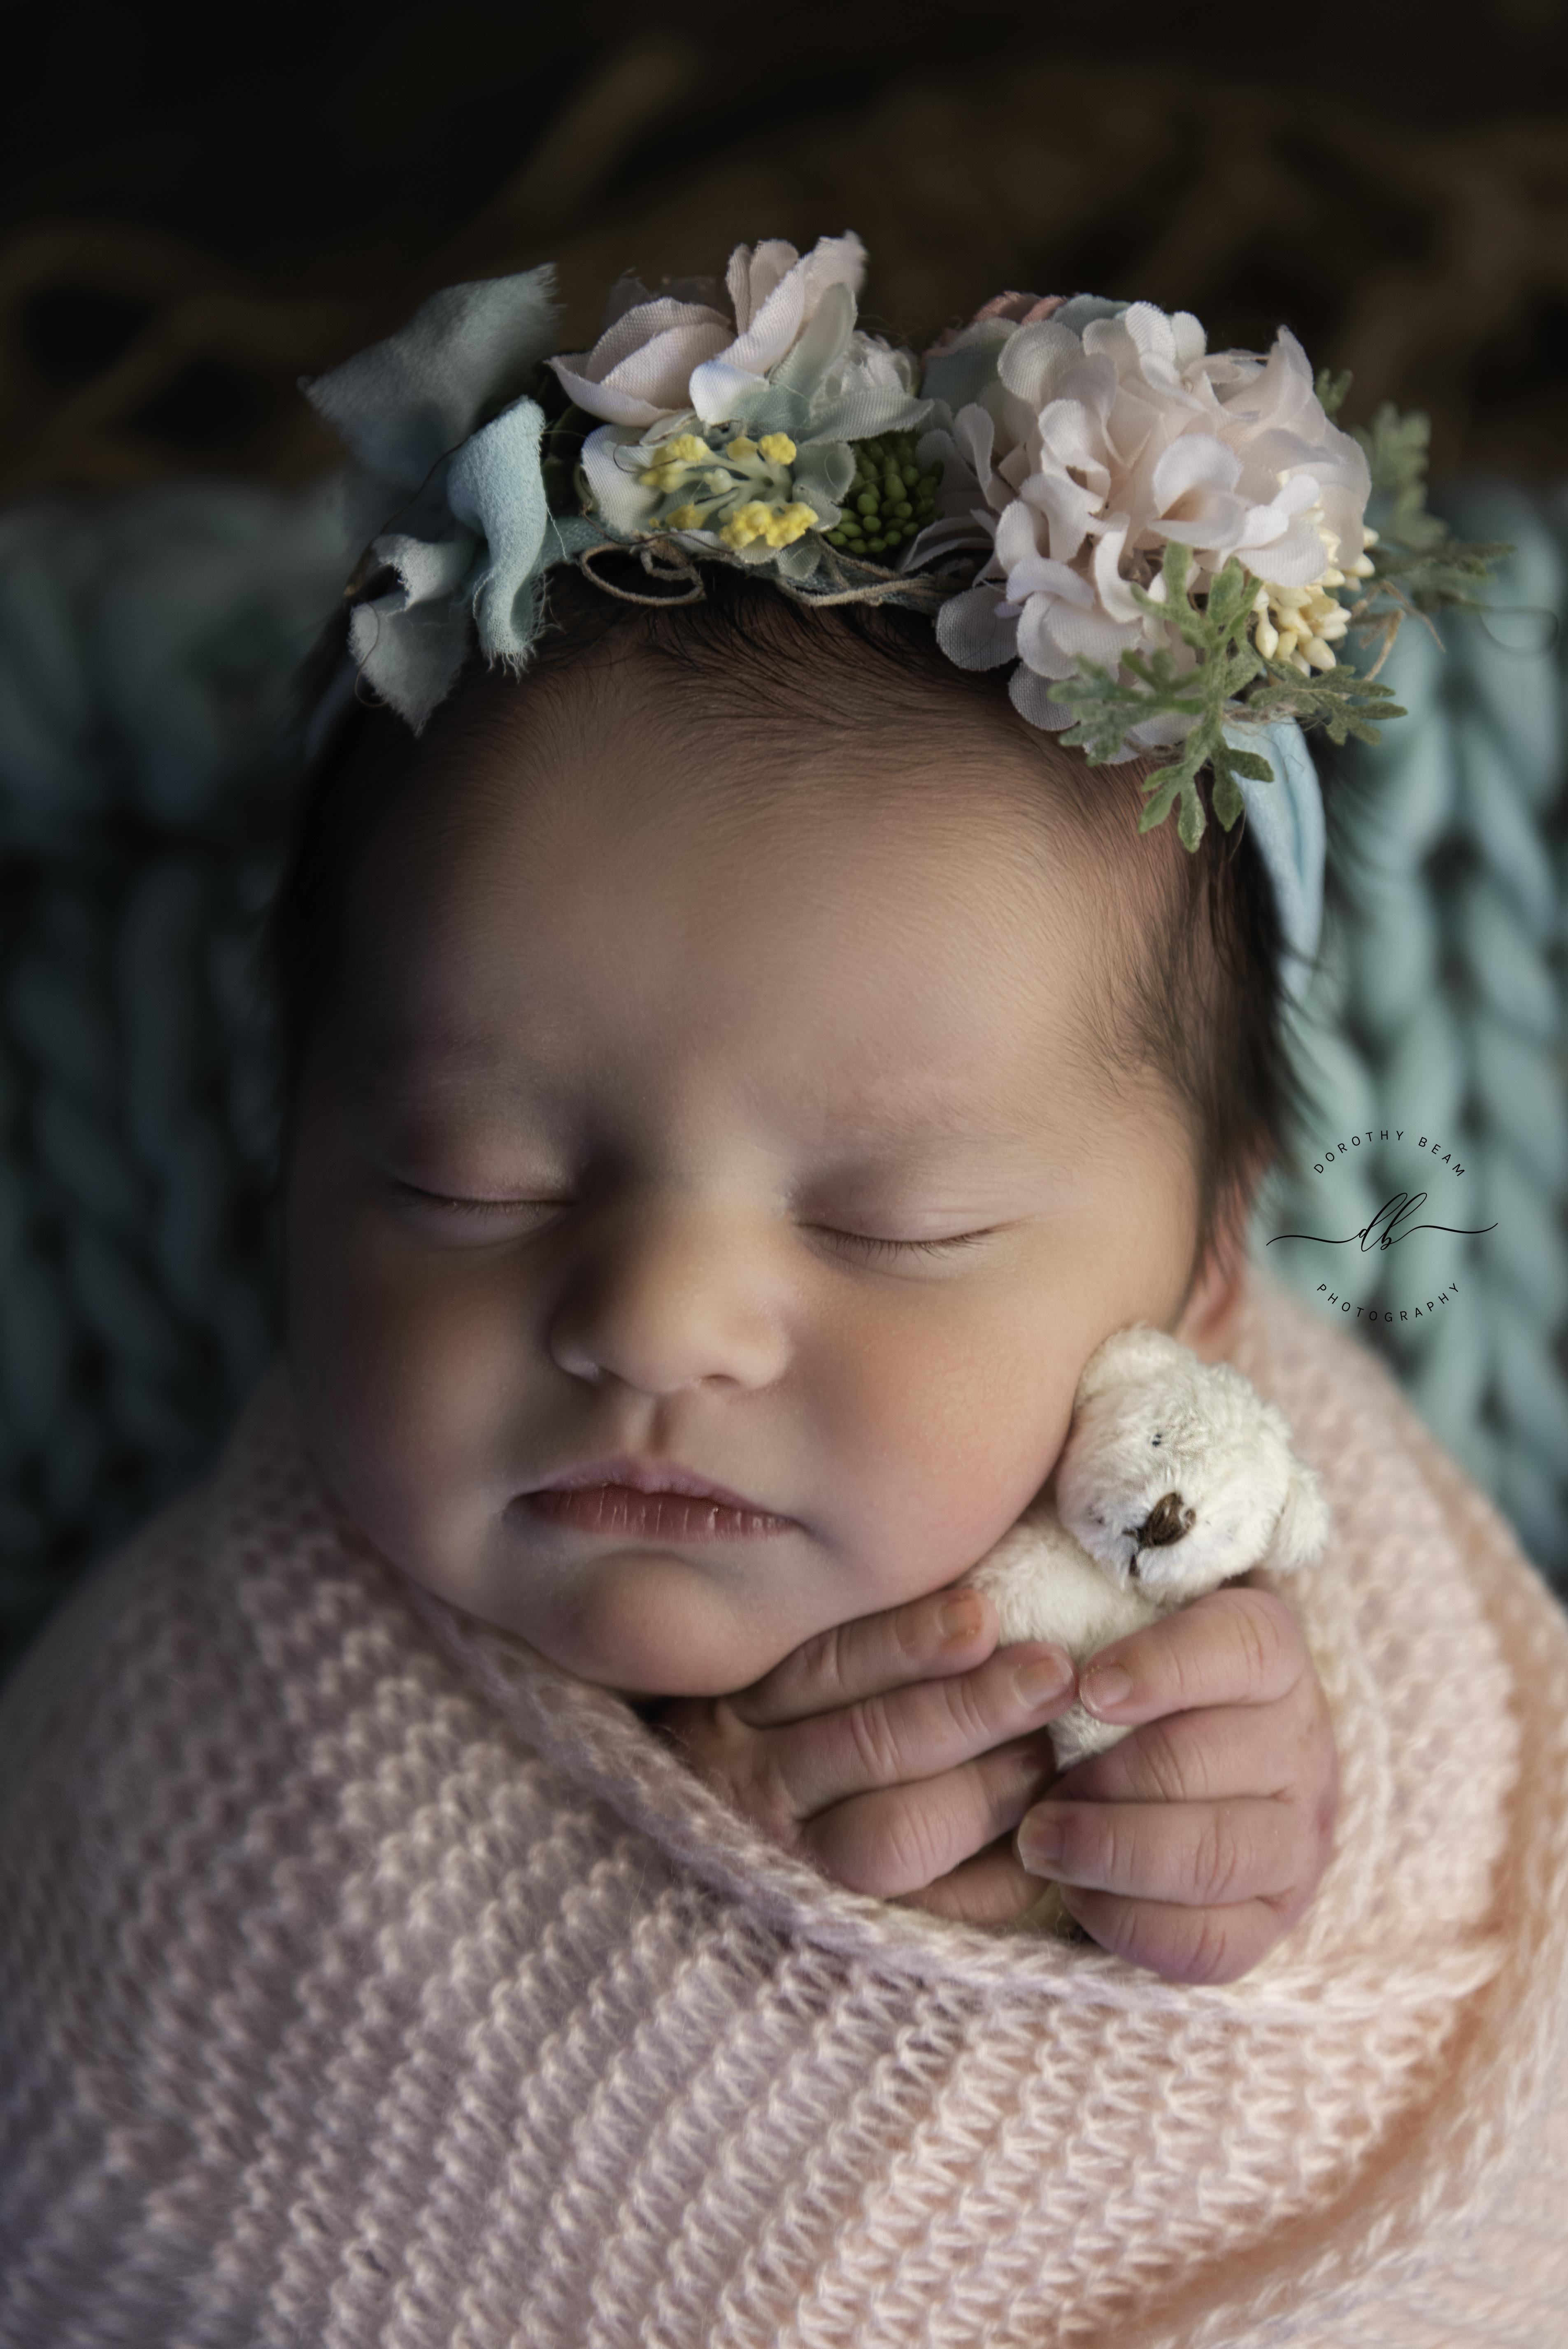 Girl Newborn Potato Sack Mint Pink